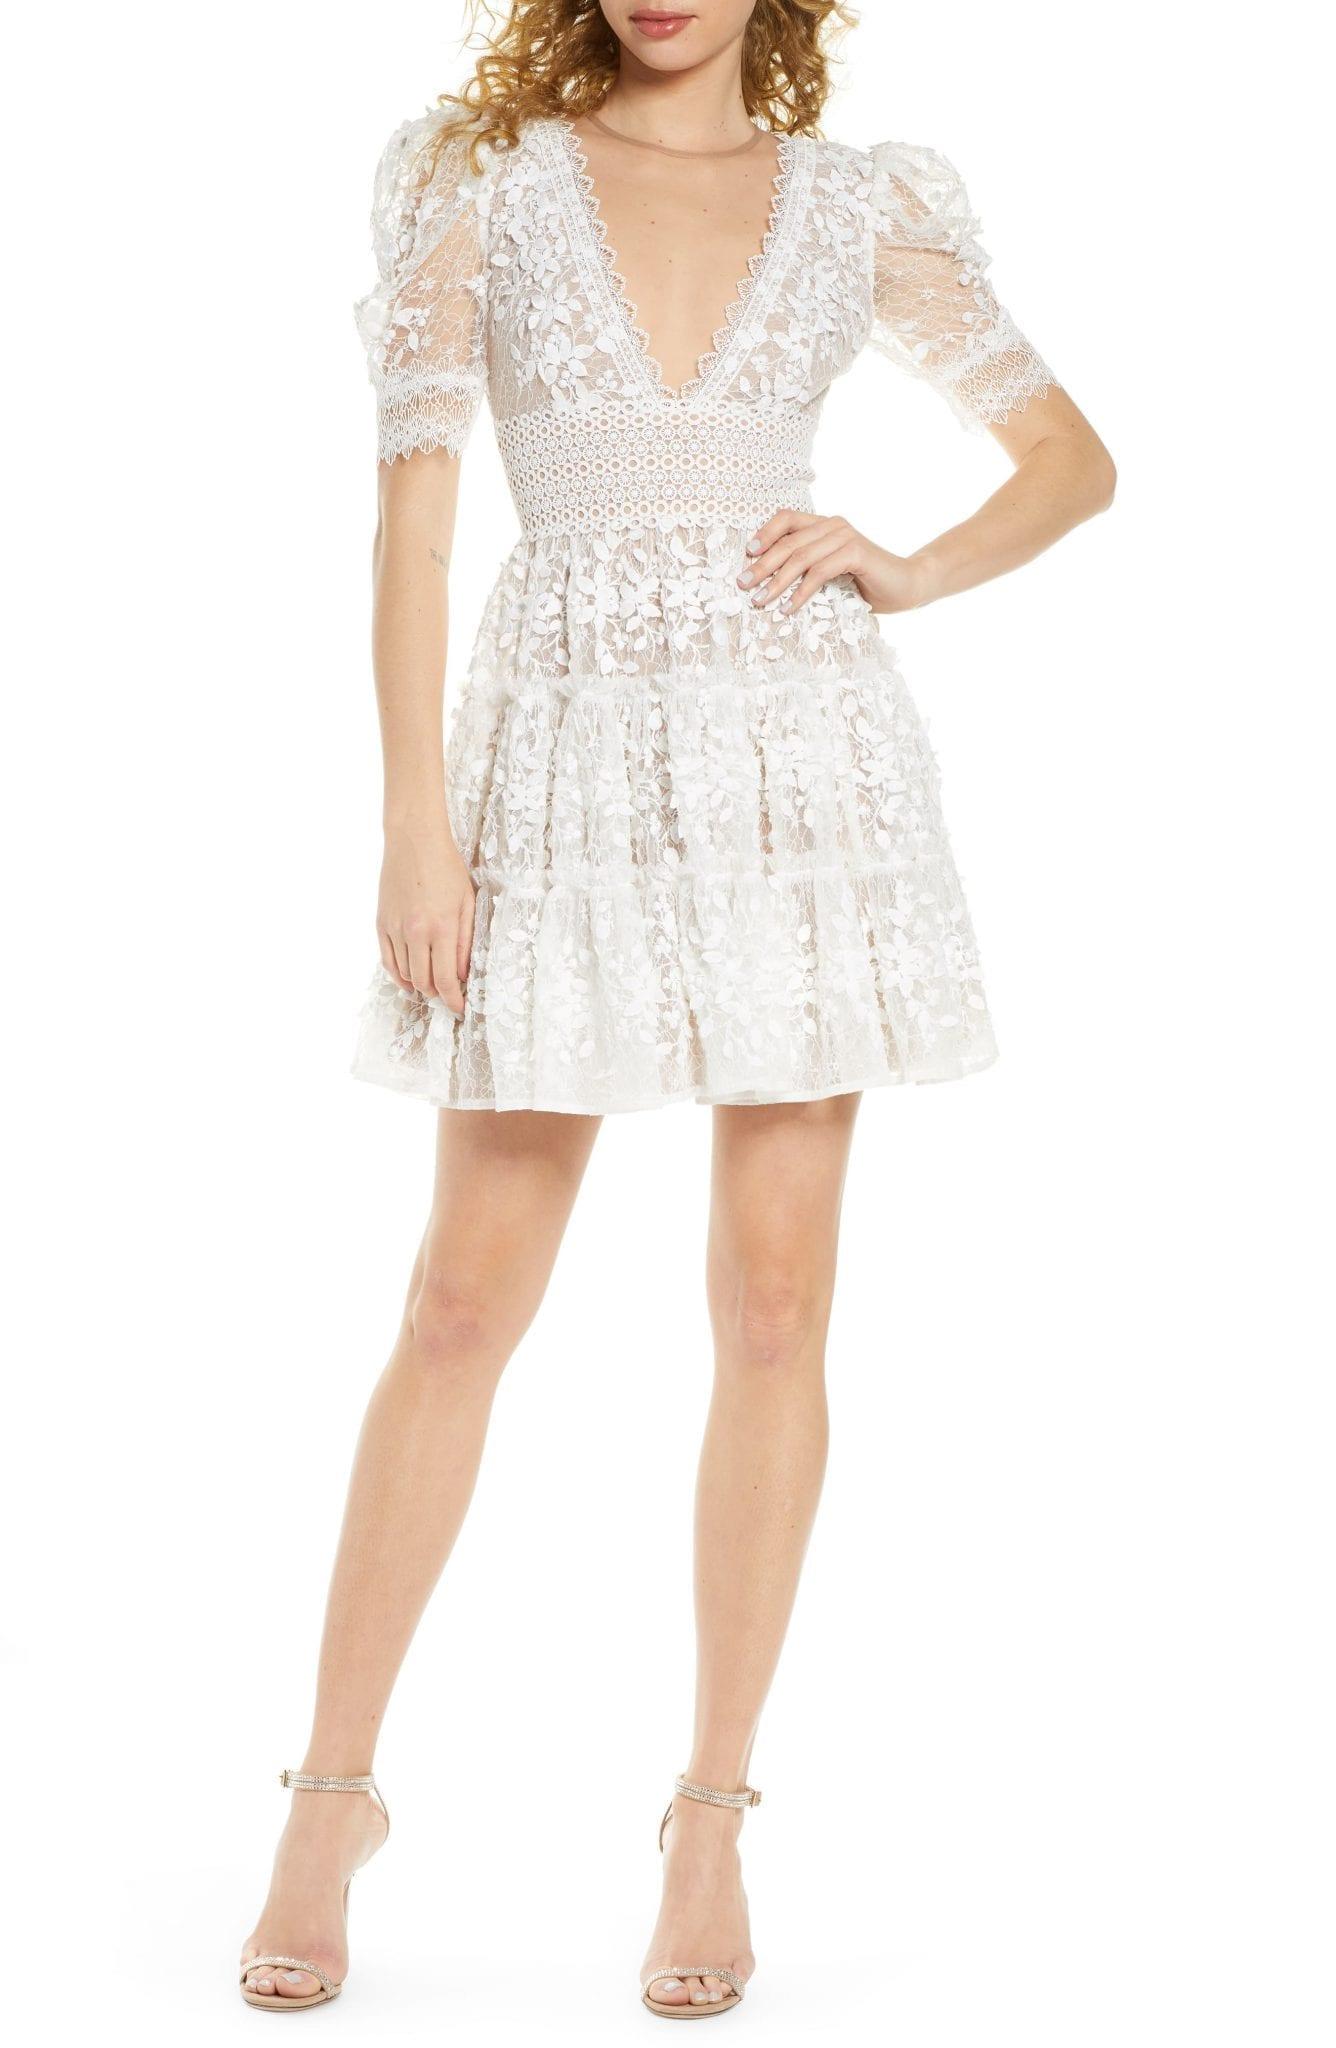 BRONX AND BANCO Megan Floral Lace Mini Dress